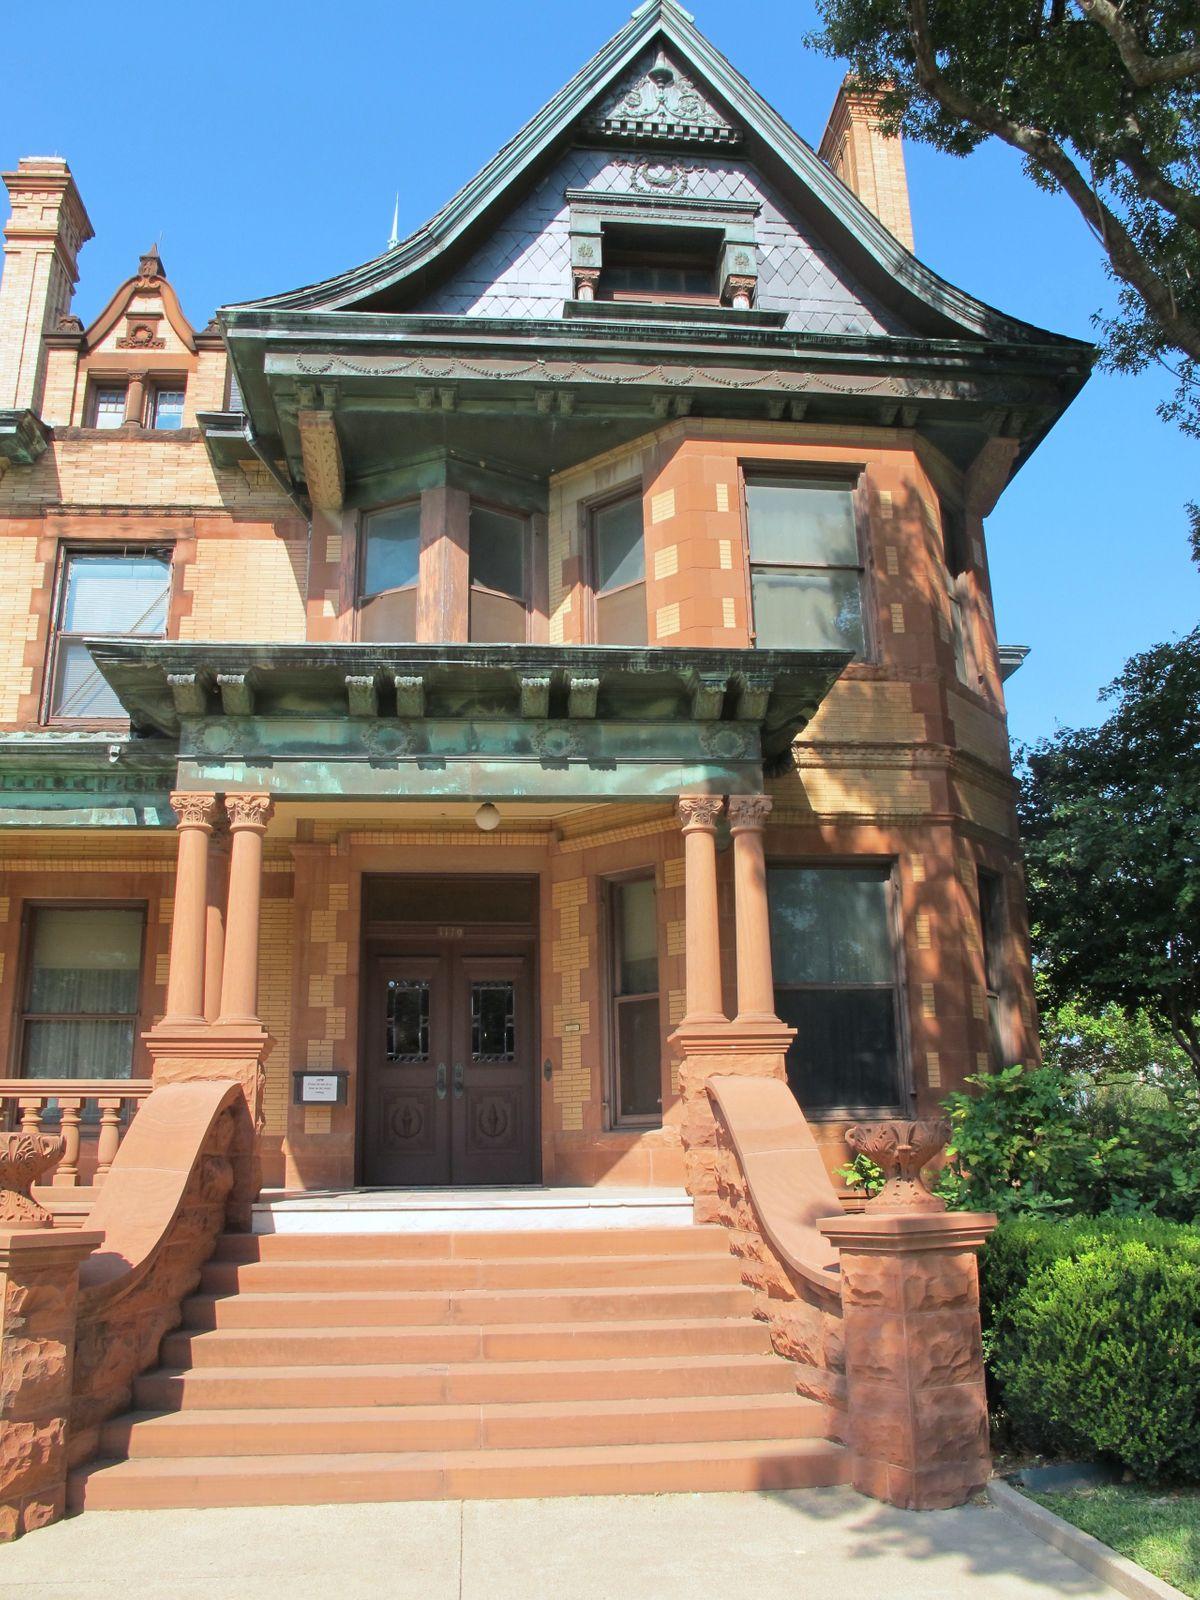 McFarland Historical Home Photo Video Shoot Location Dallas 29.jpg